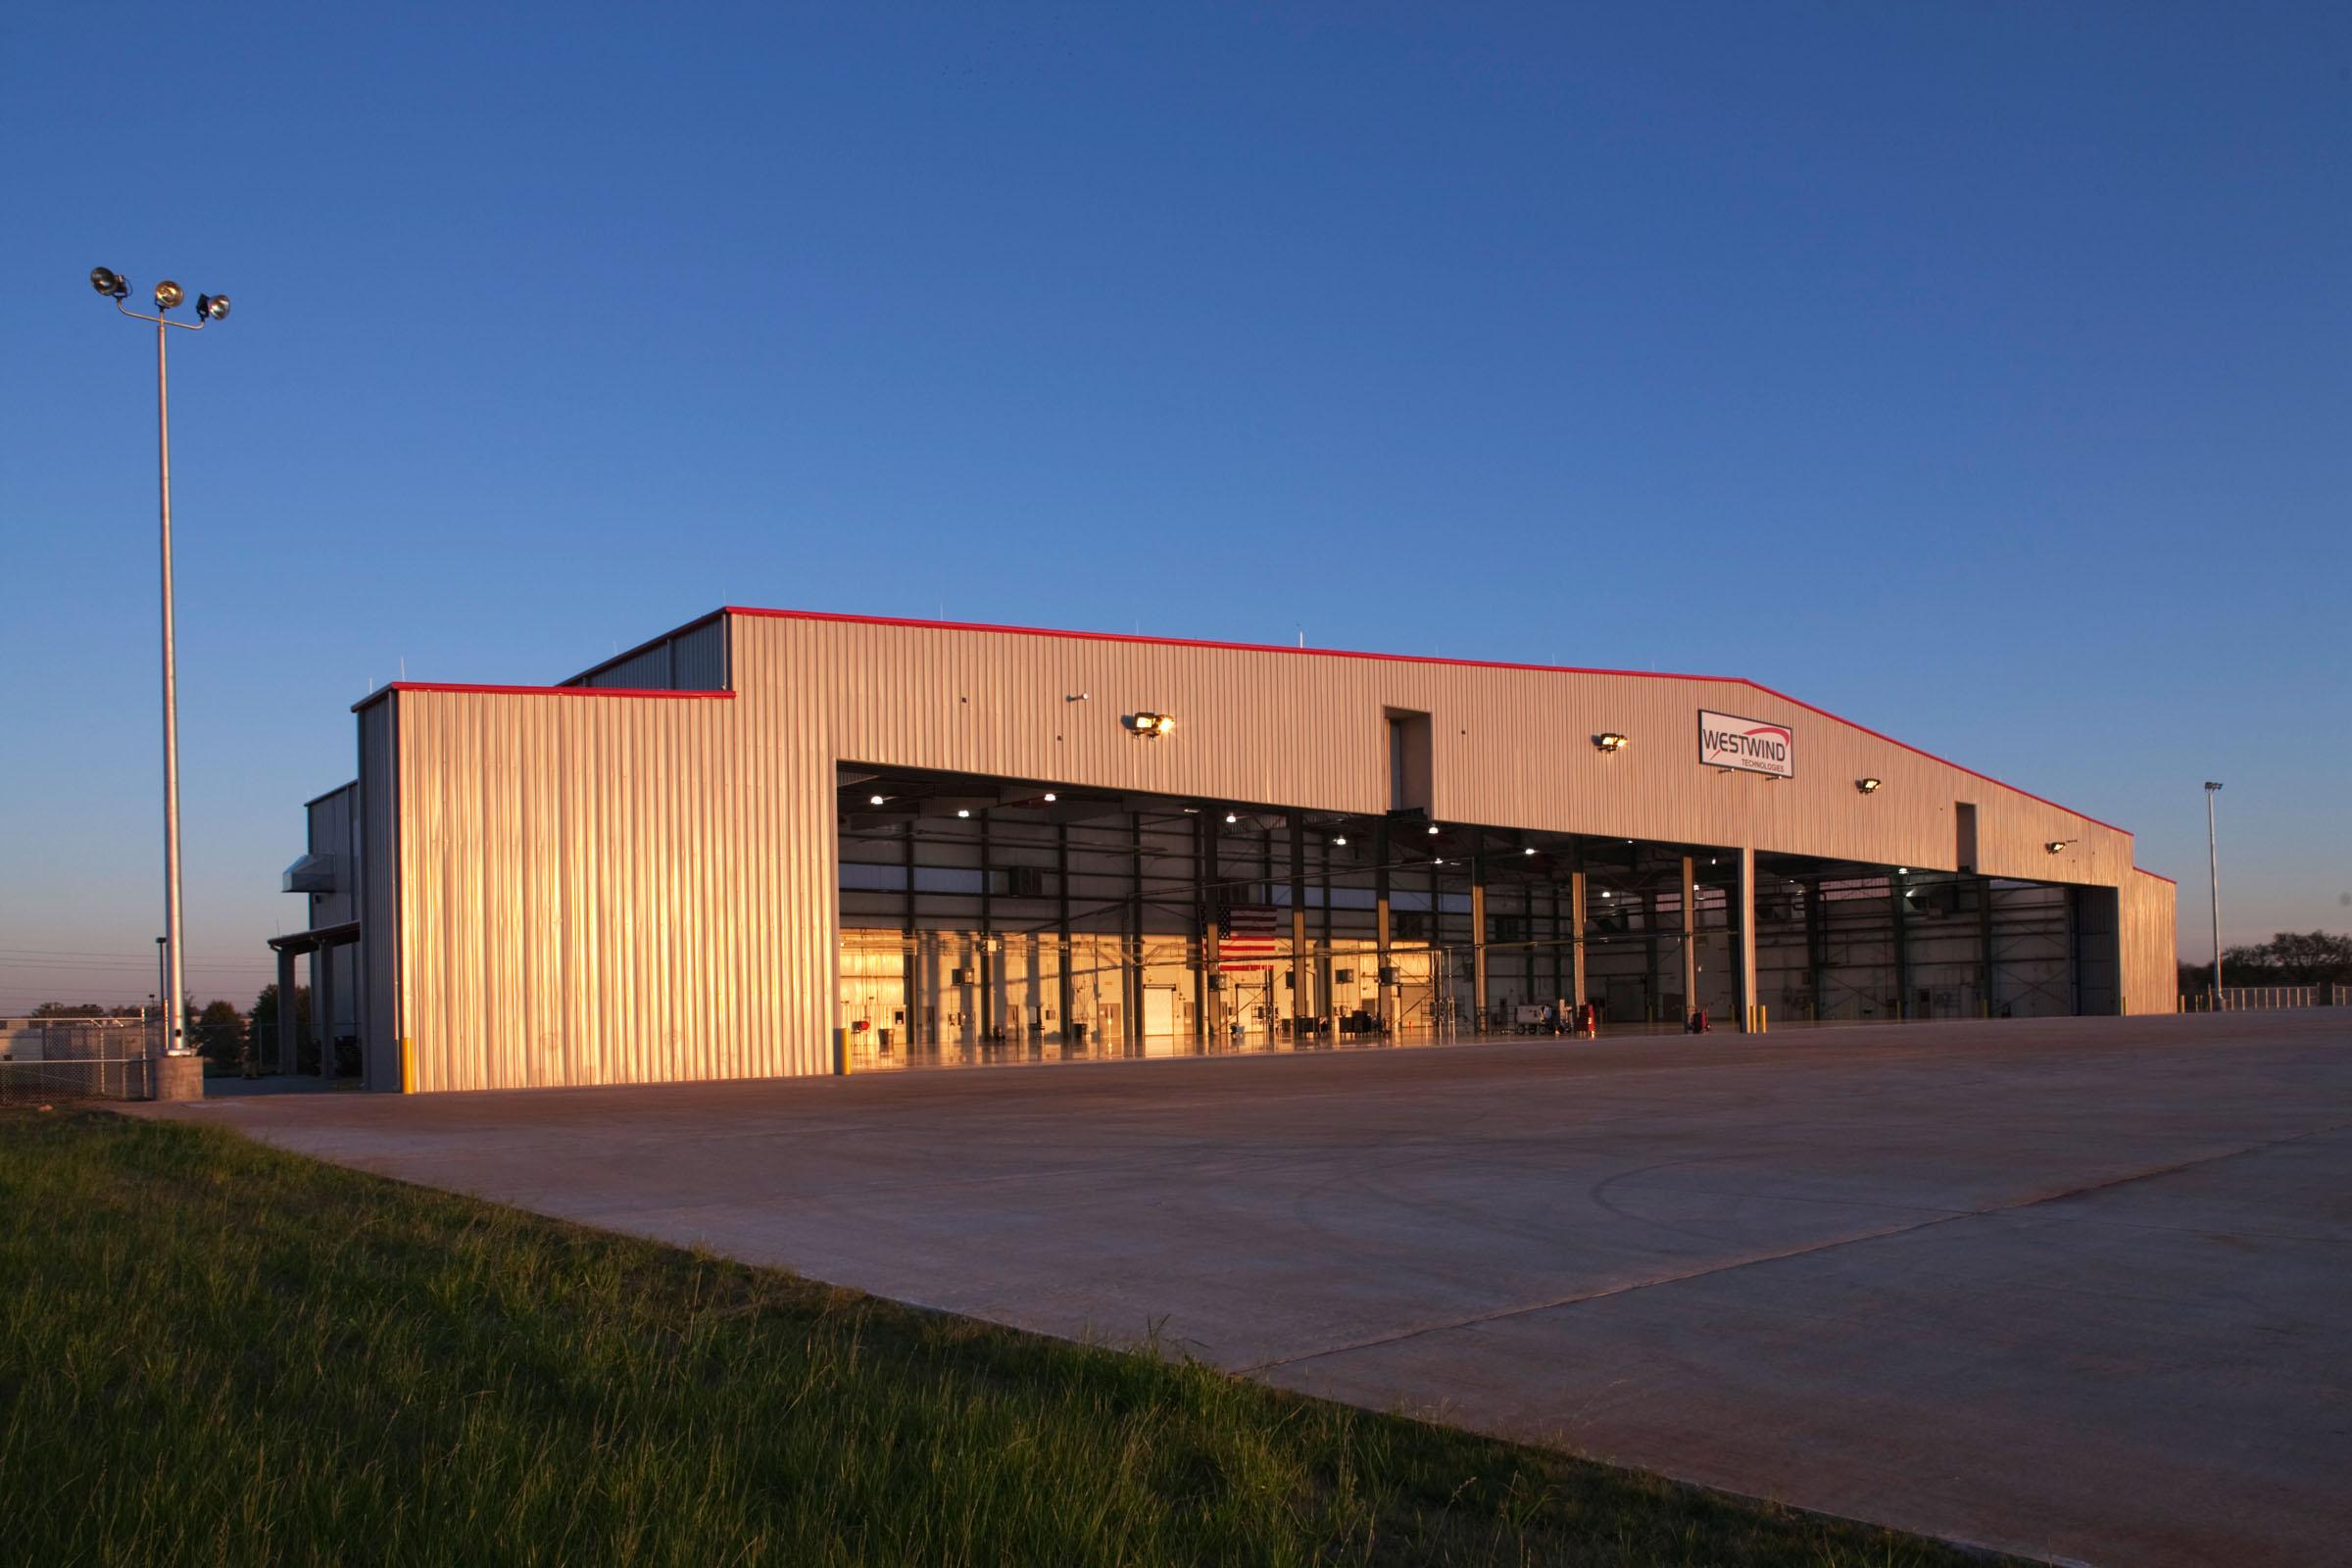 WestWind Hangar